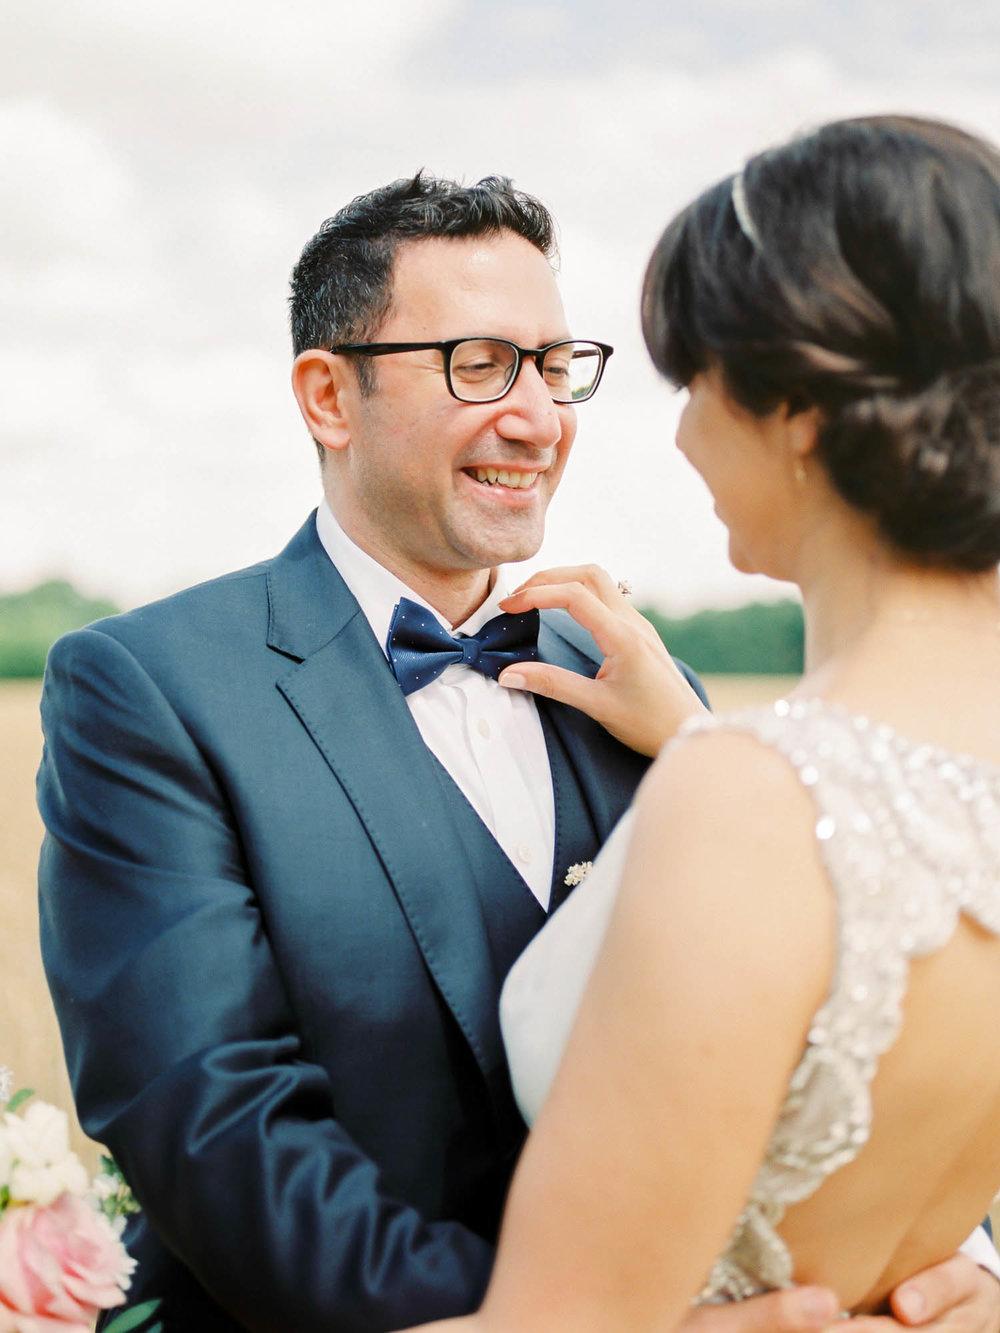 Amy O'Boyle Photography- Destination & UK Fine Art Film Wedding Photographer- Brickendonbury Estate Wedding-29.jpg